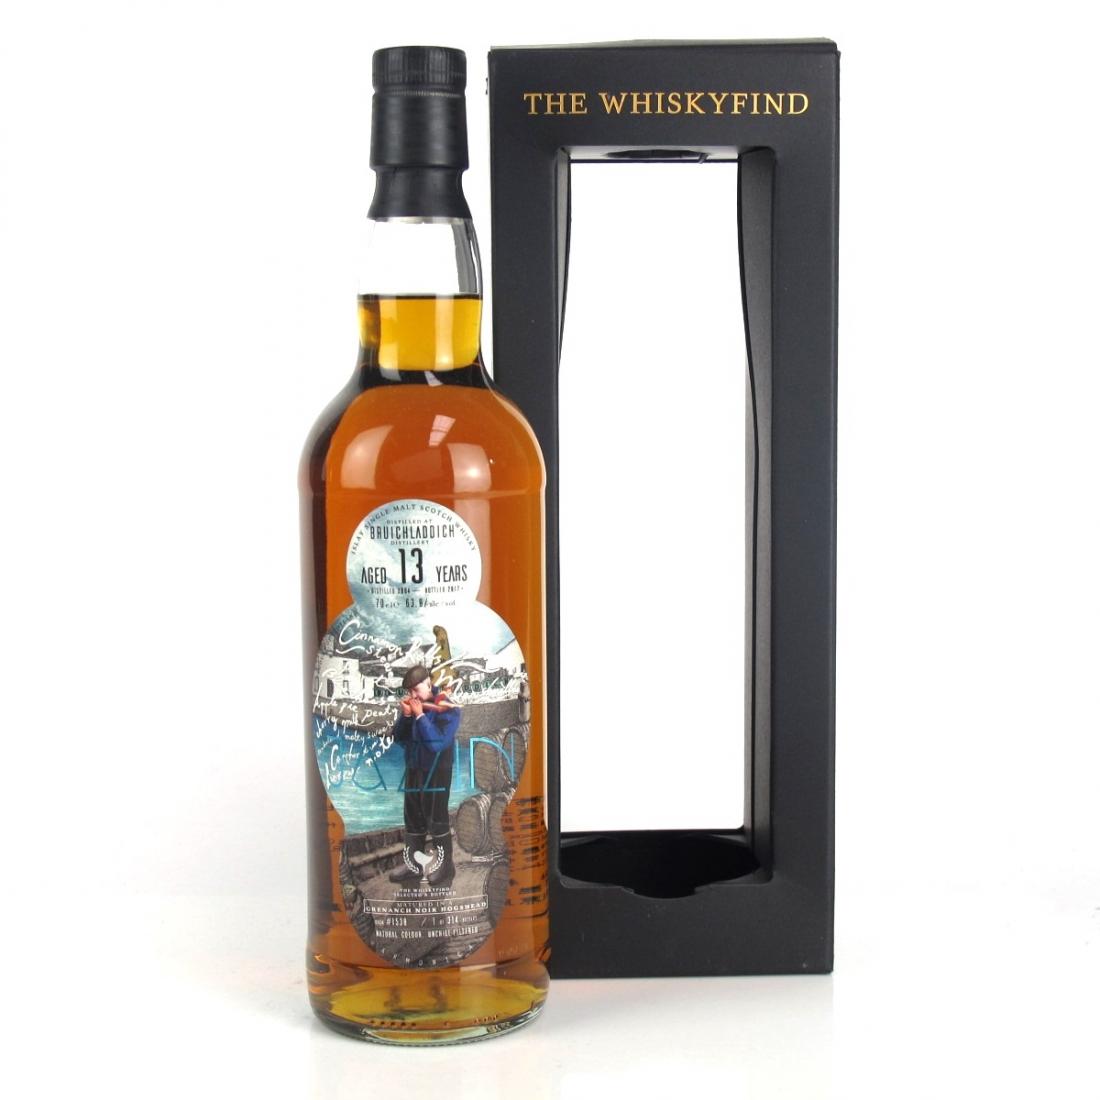 Bruichladdich 2004 Whisky Find 13 Year Old